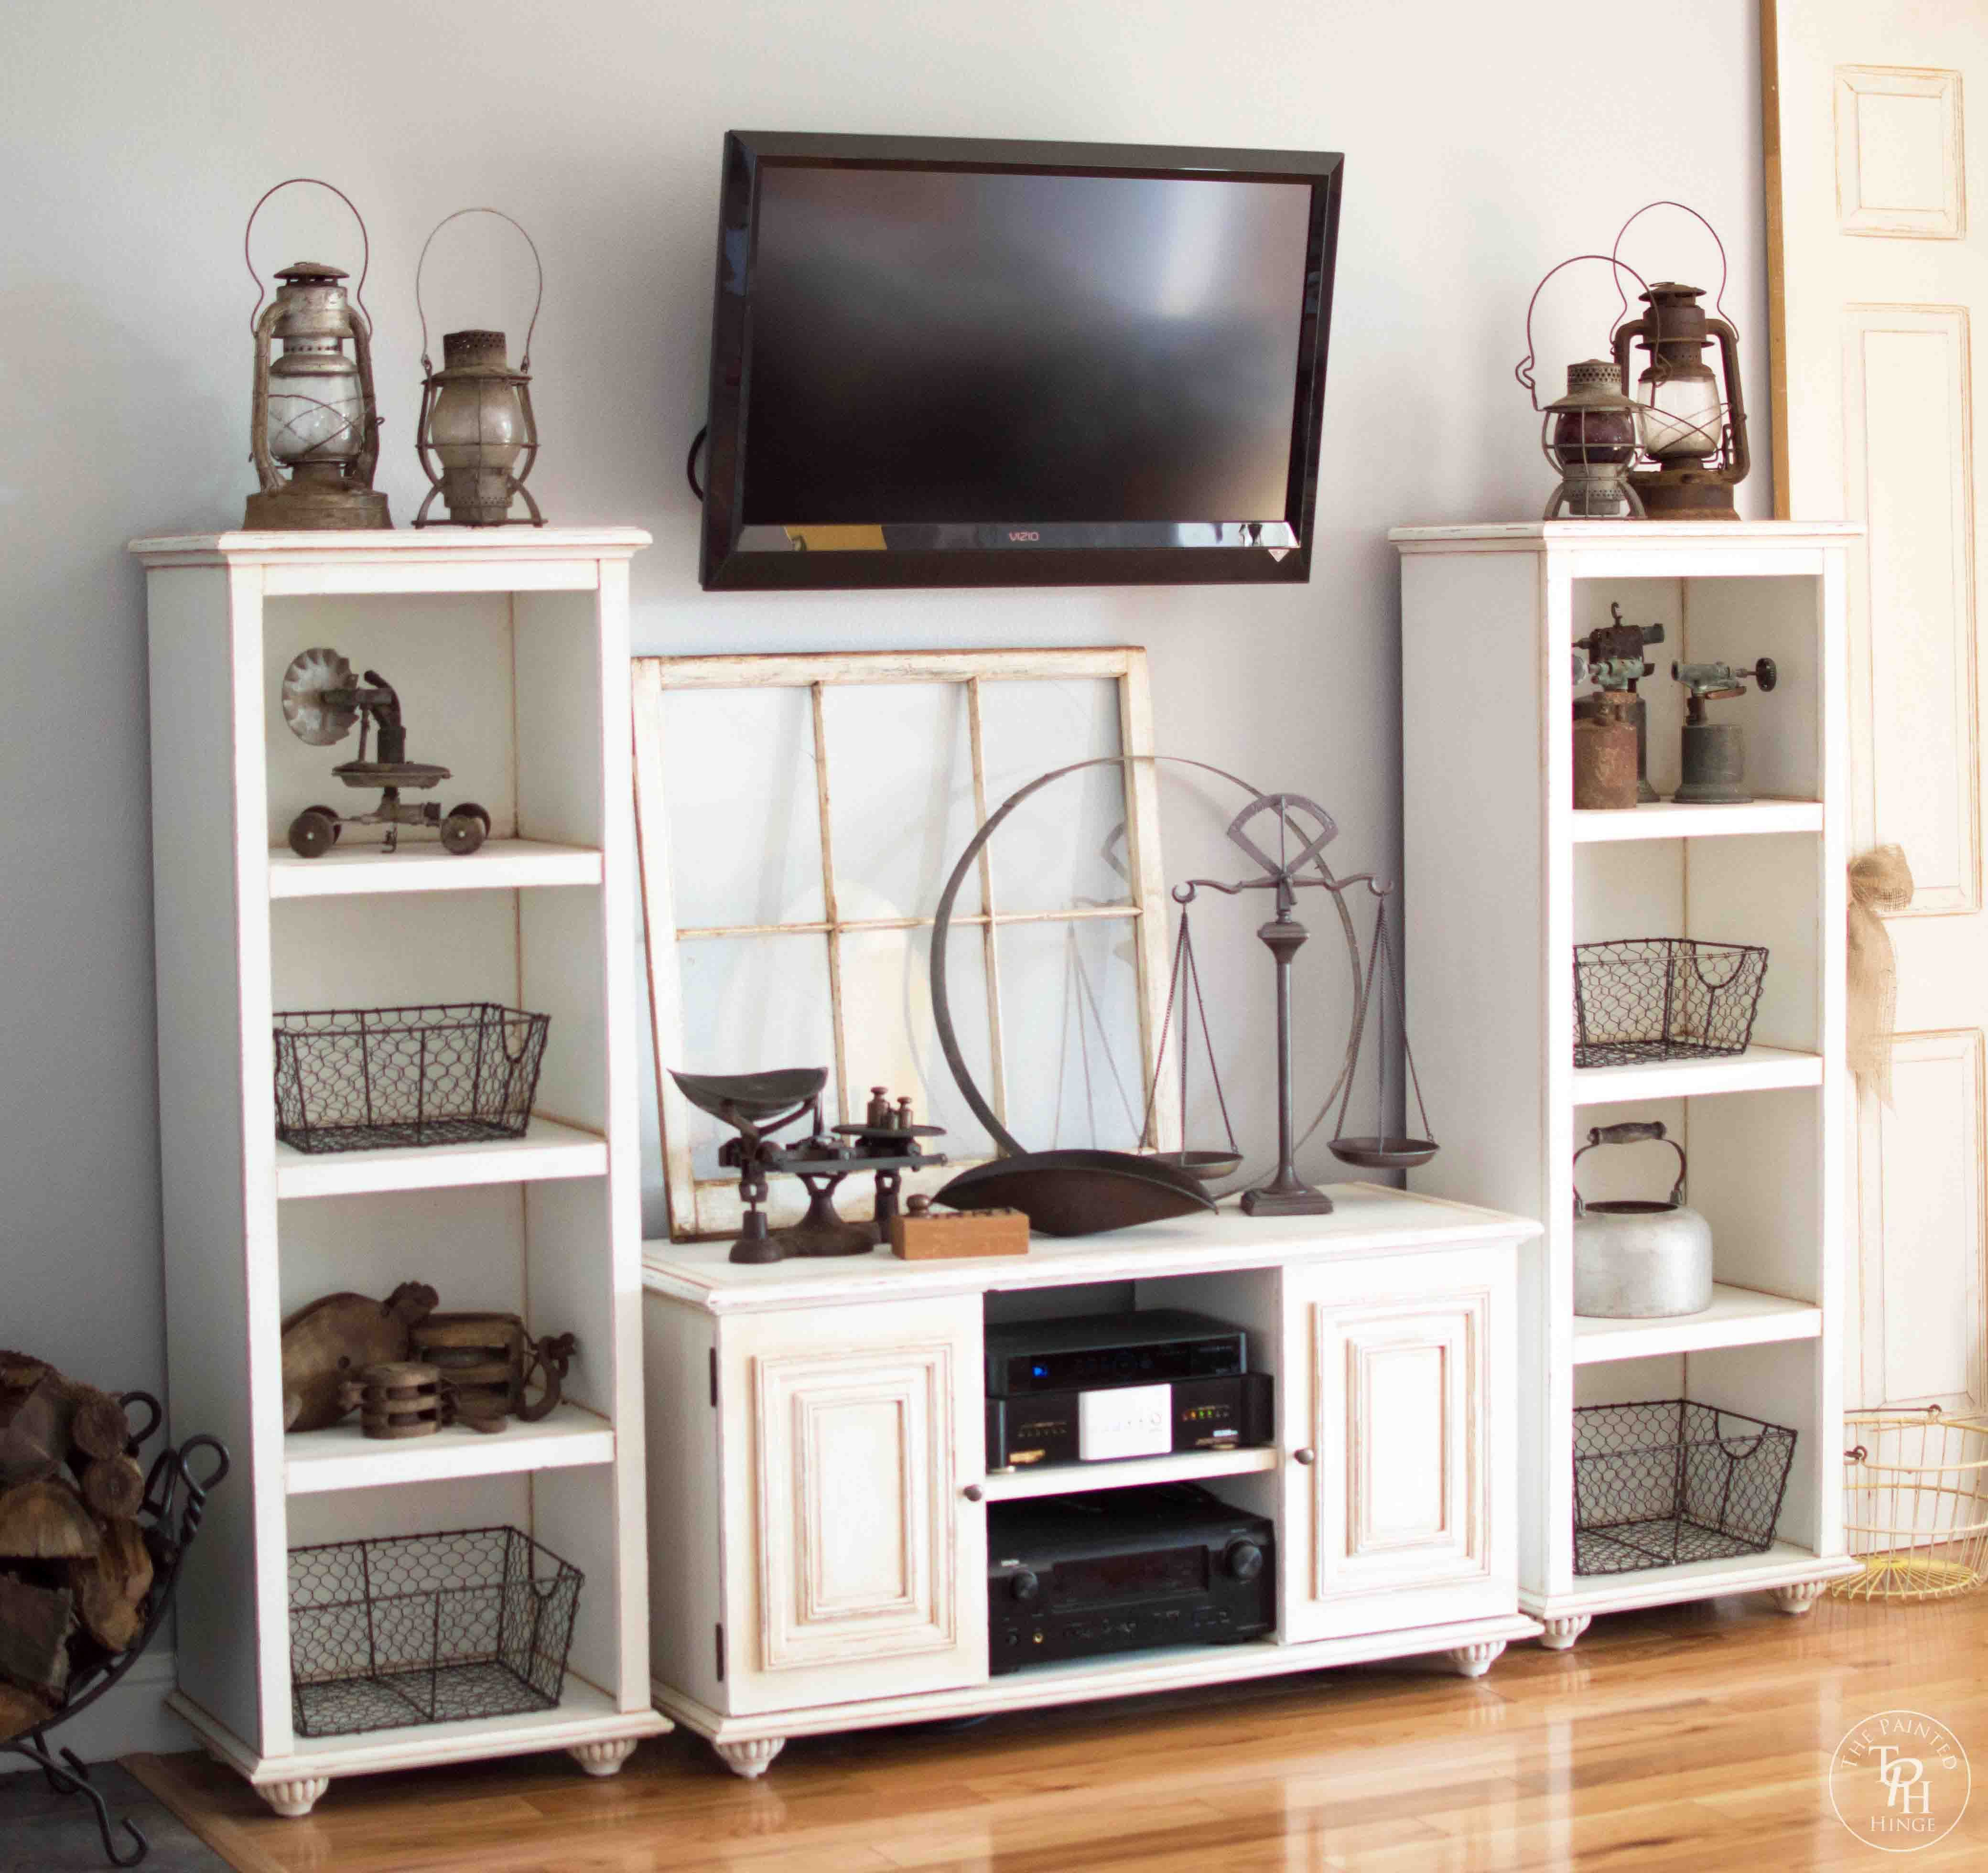 home best center pin ideas furniture cupboard entertainment fun diy more watch